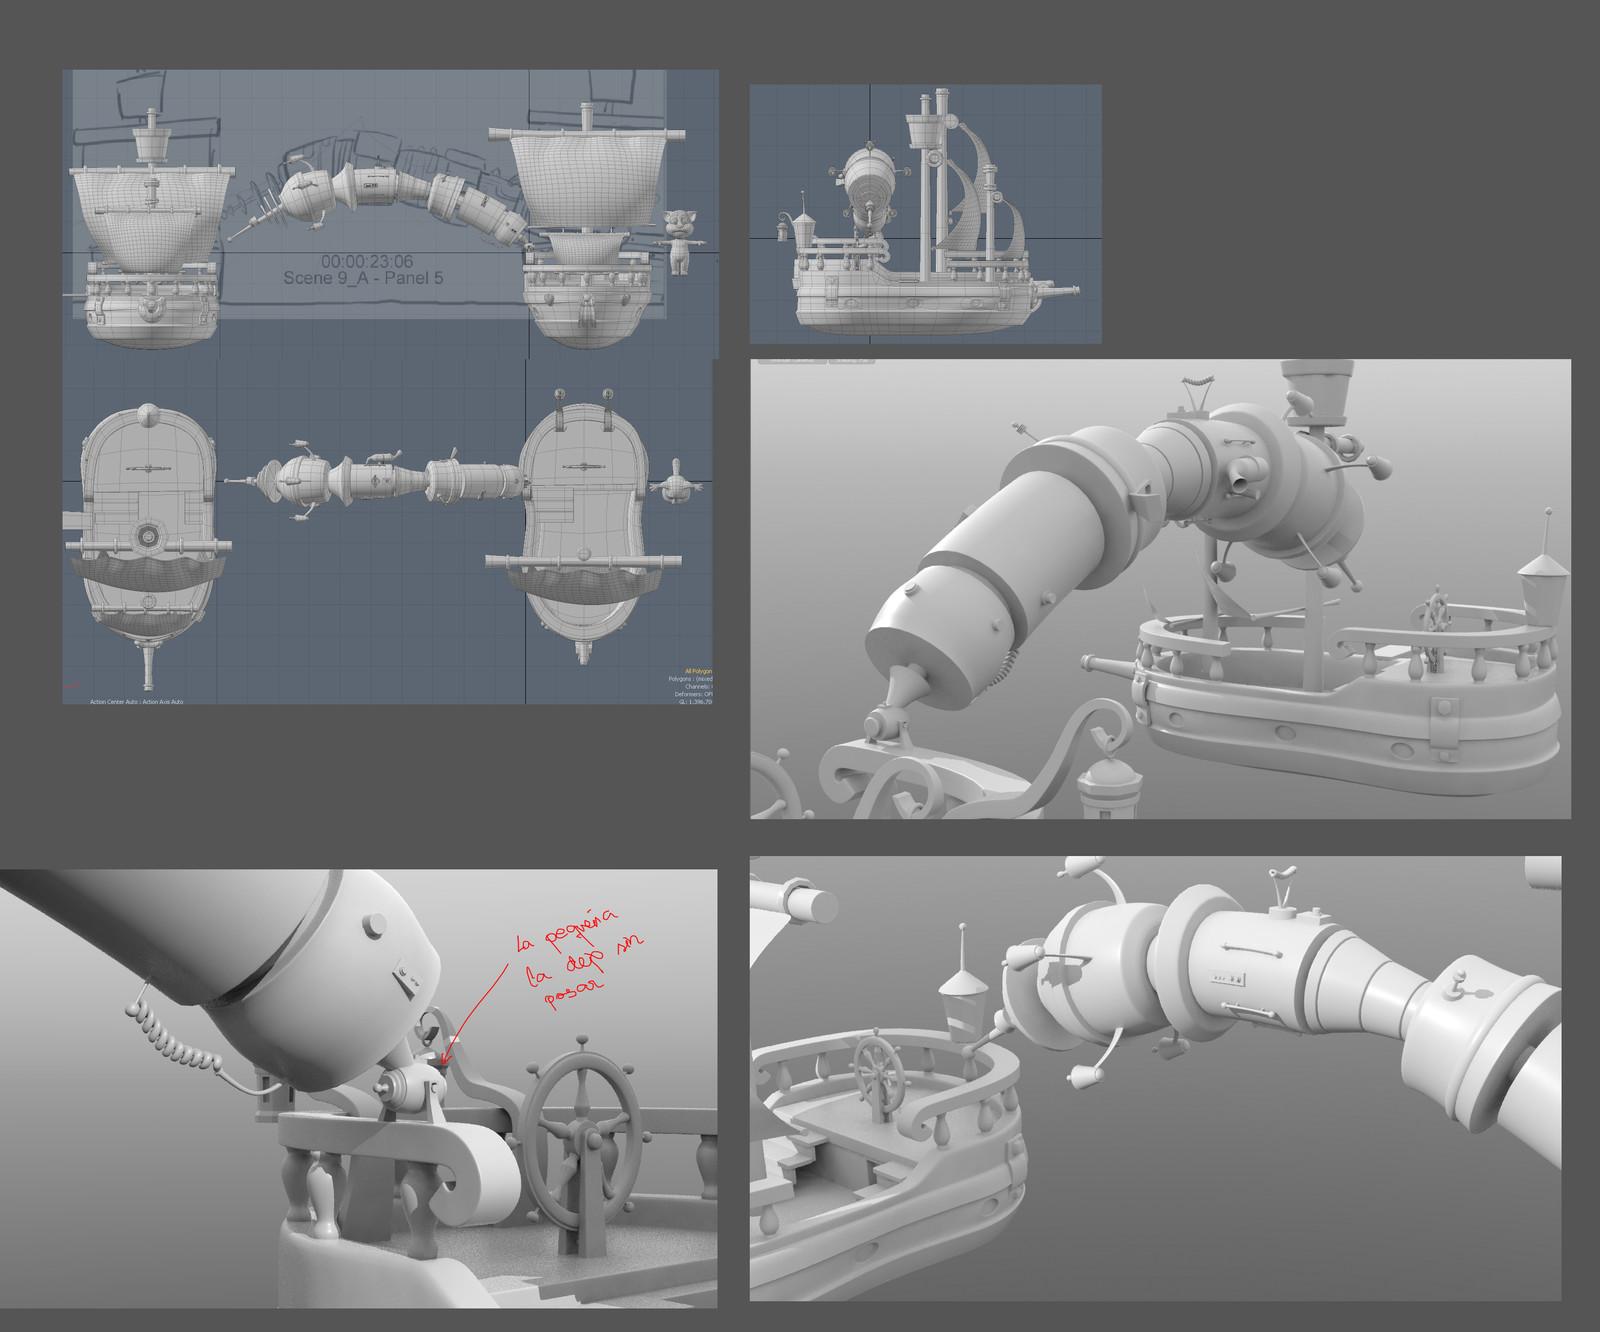 Storyboard, Tom and ships models provided by Hampa Studio